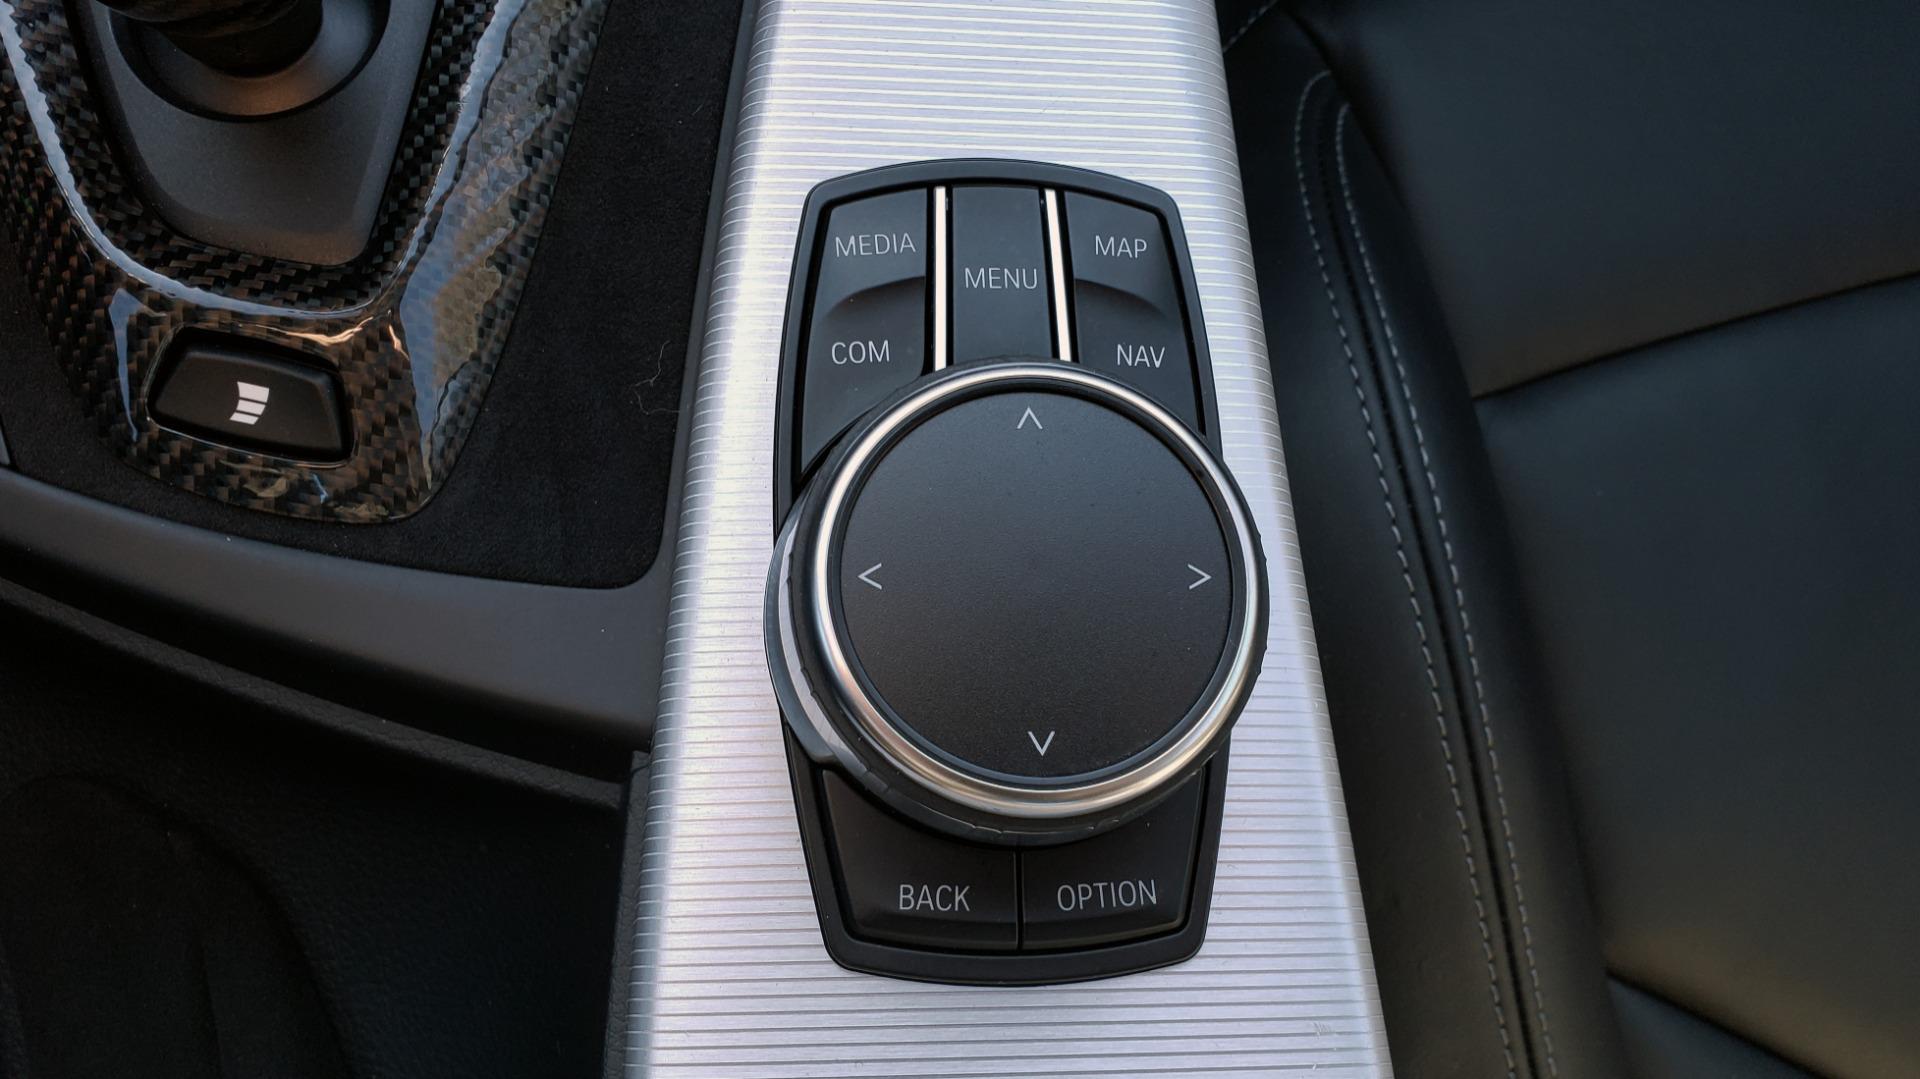 Used 2018 BMW M4 COMP PKG / EXEC / M-DRIVER / PARK CNTRL / ACTIVE BLIND SPOT for sale $45,449 at Formula Imports in Charlotte NC 28227 53